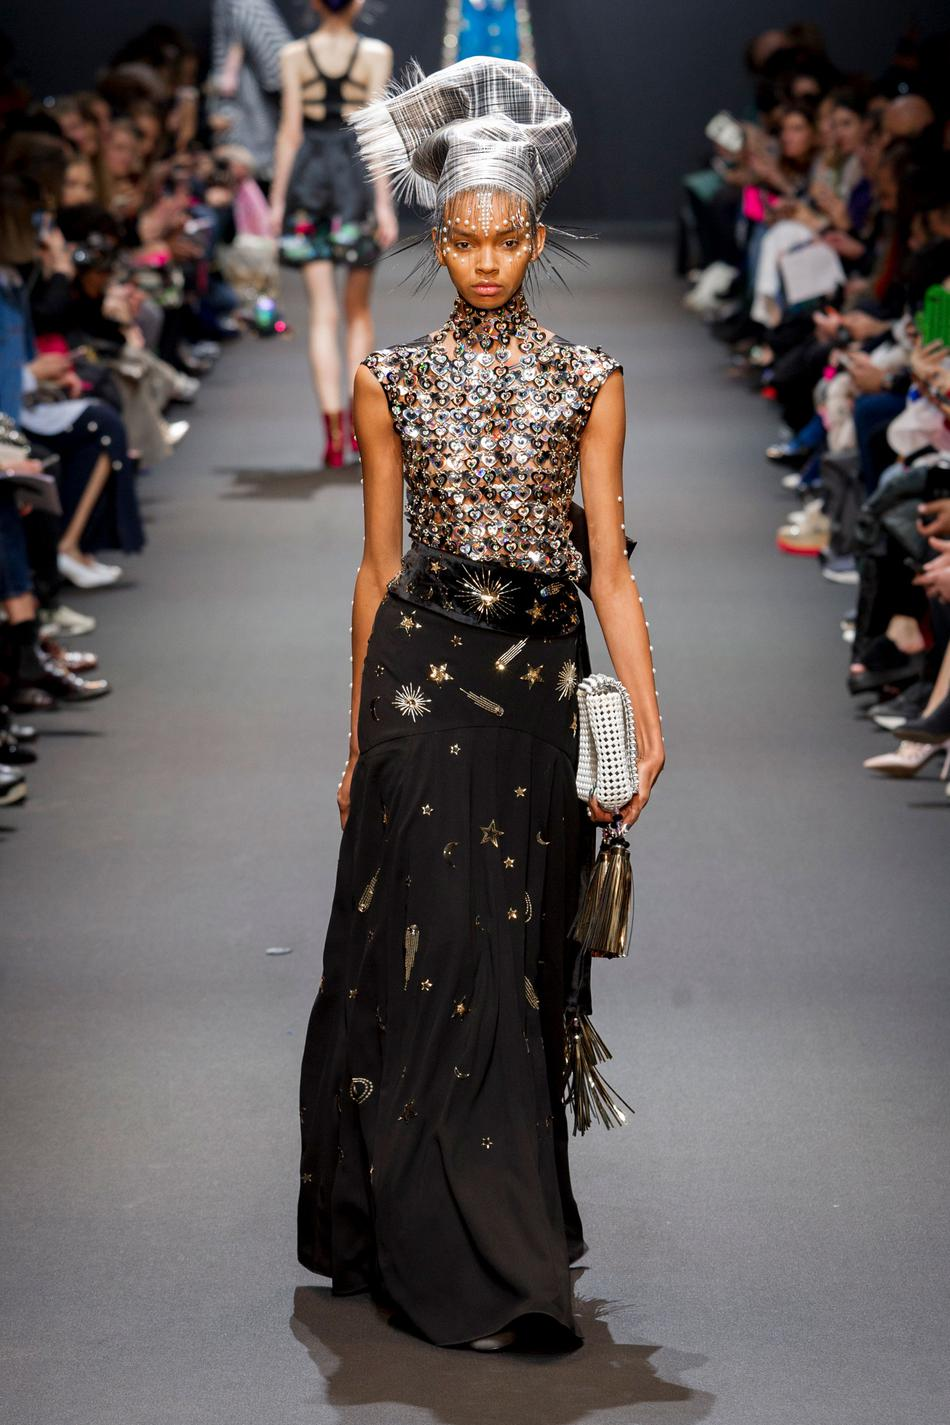 Défilé Manish Arora Fashion Week 2017 - Look 31